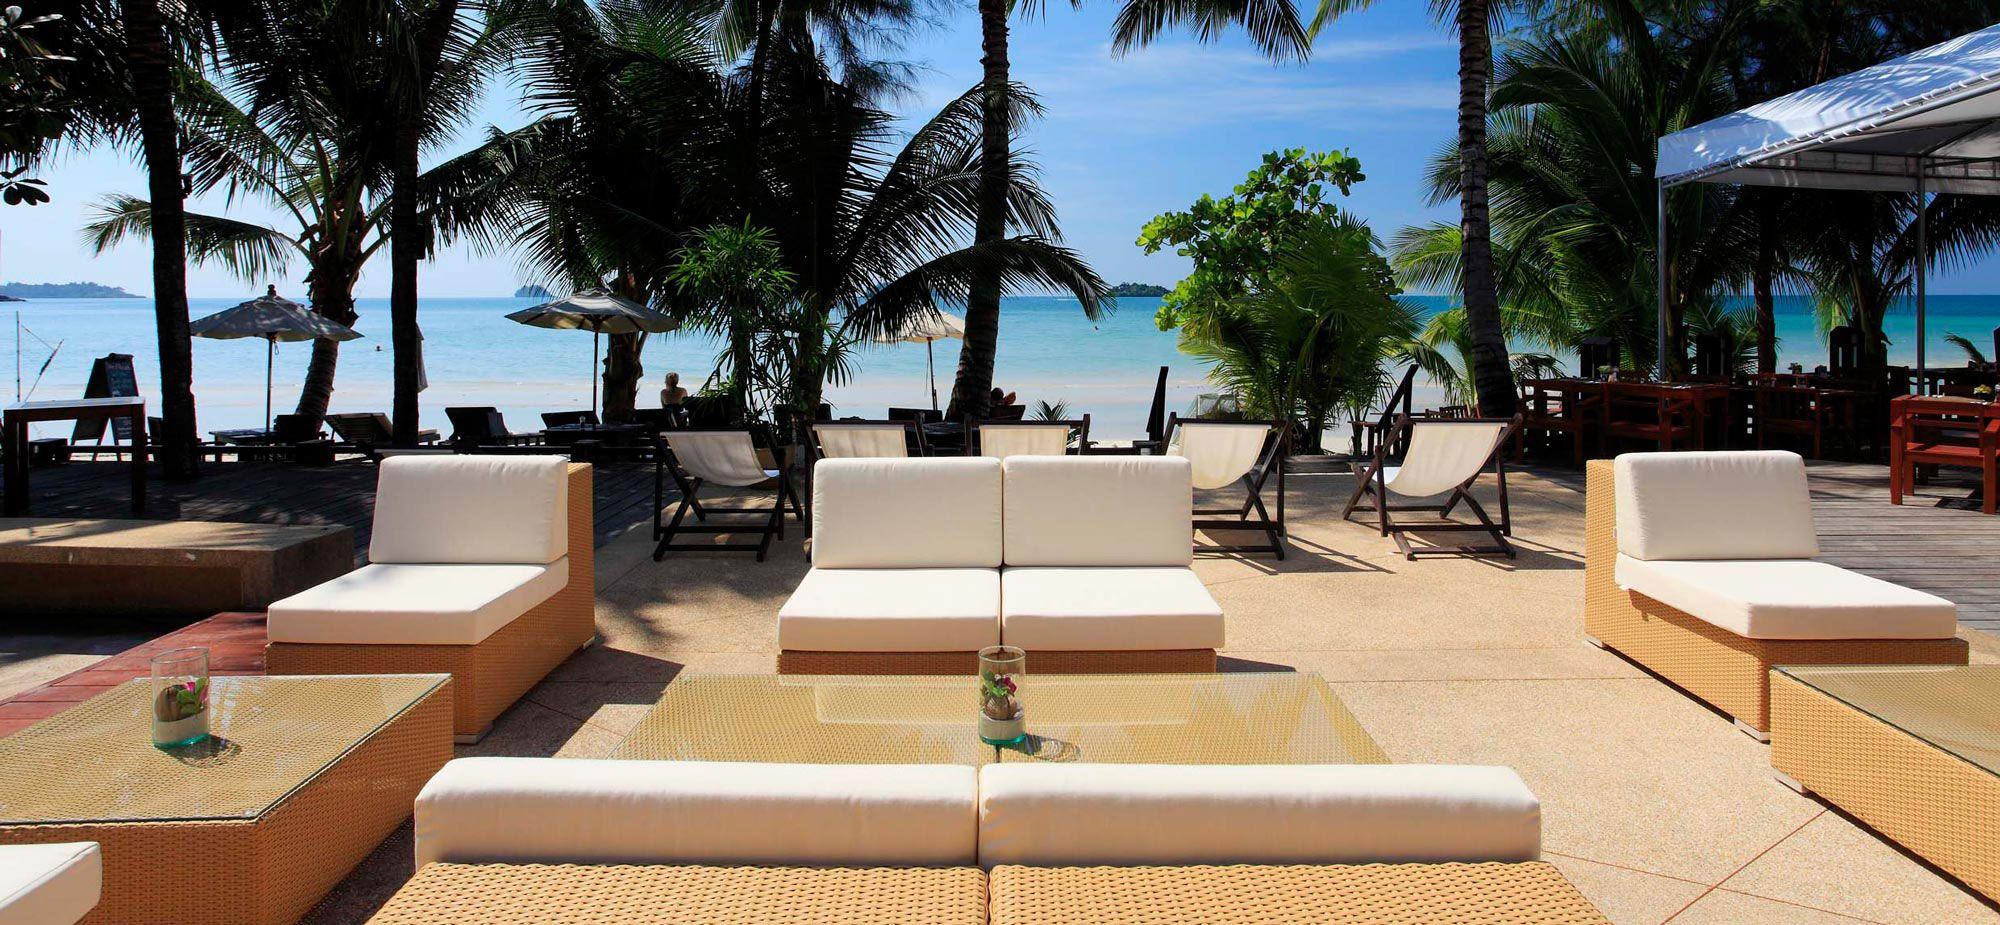 Centara Koh Chang Tropicana Resort Thailand Resortthailandboutique Hotelsrestaurantsdinersrestaurant